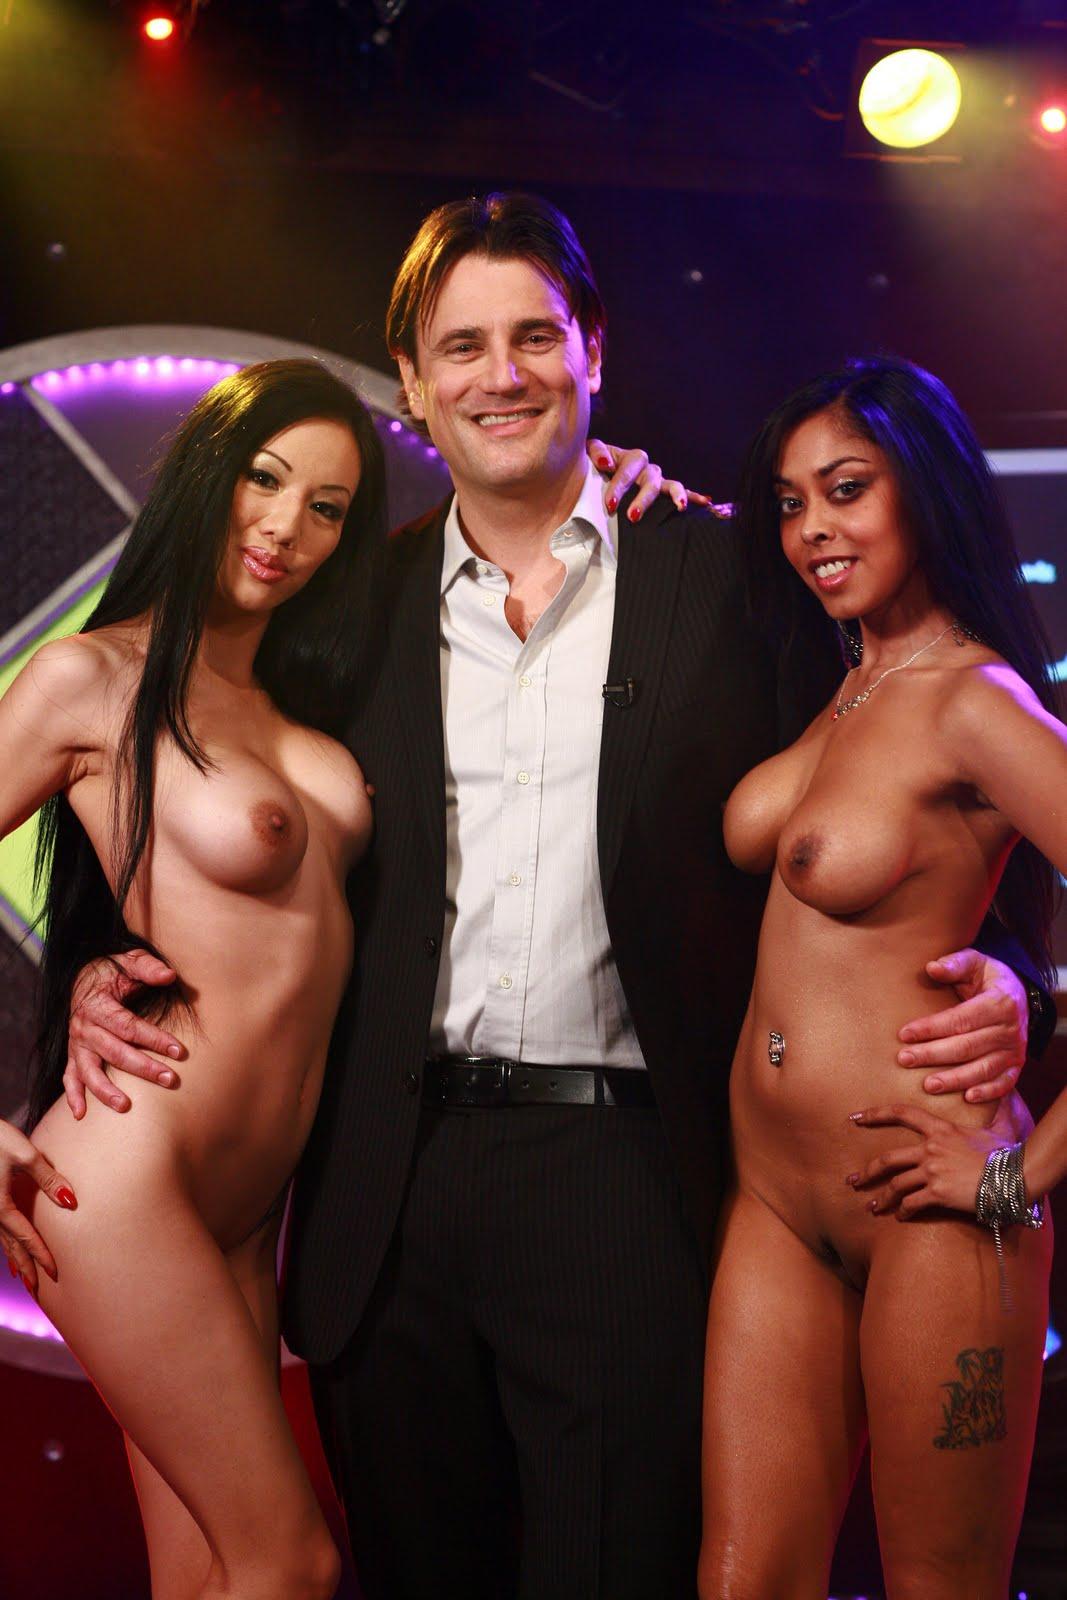 Nude Girls On Howard Stern Show